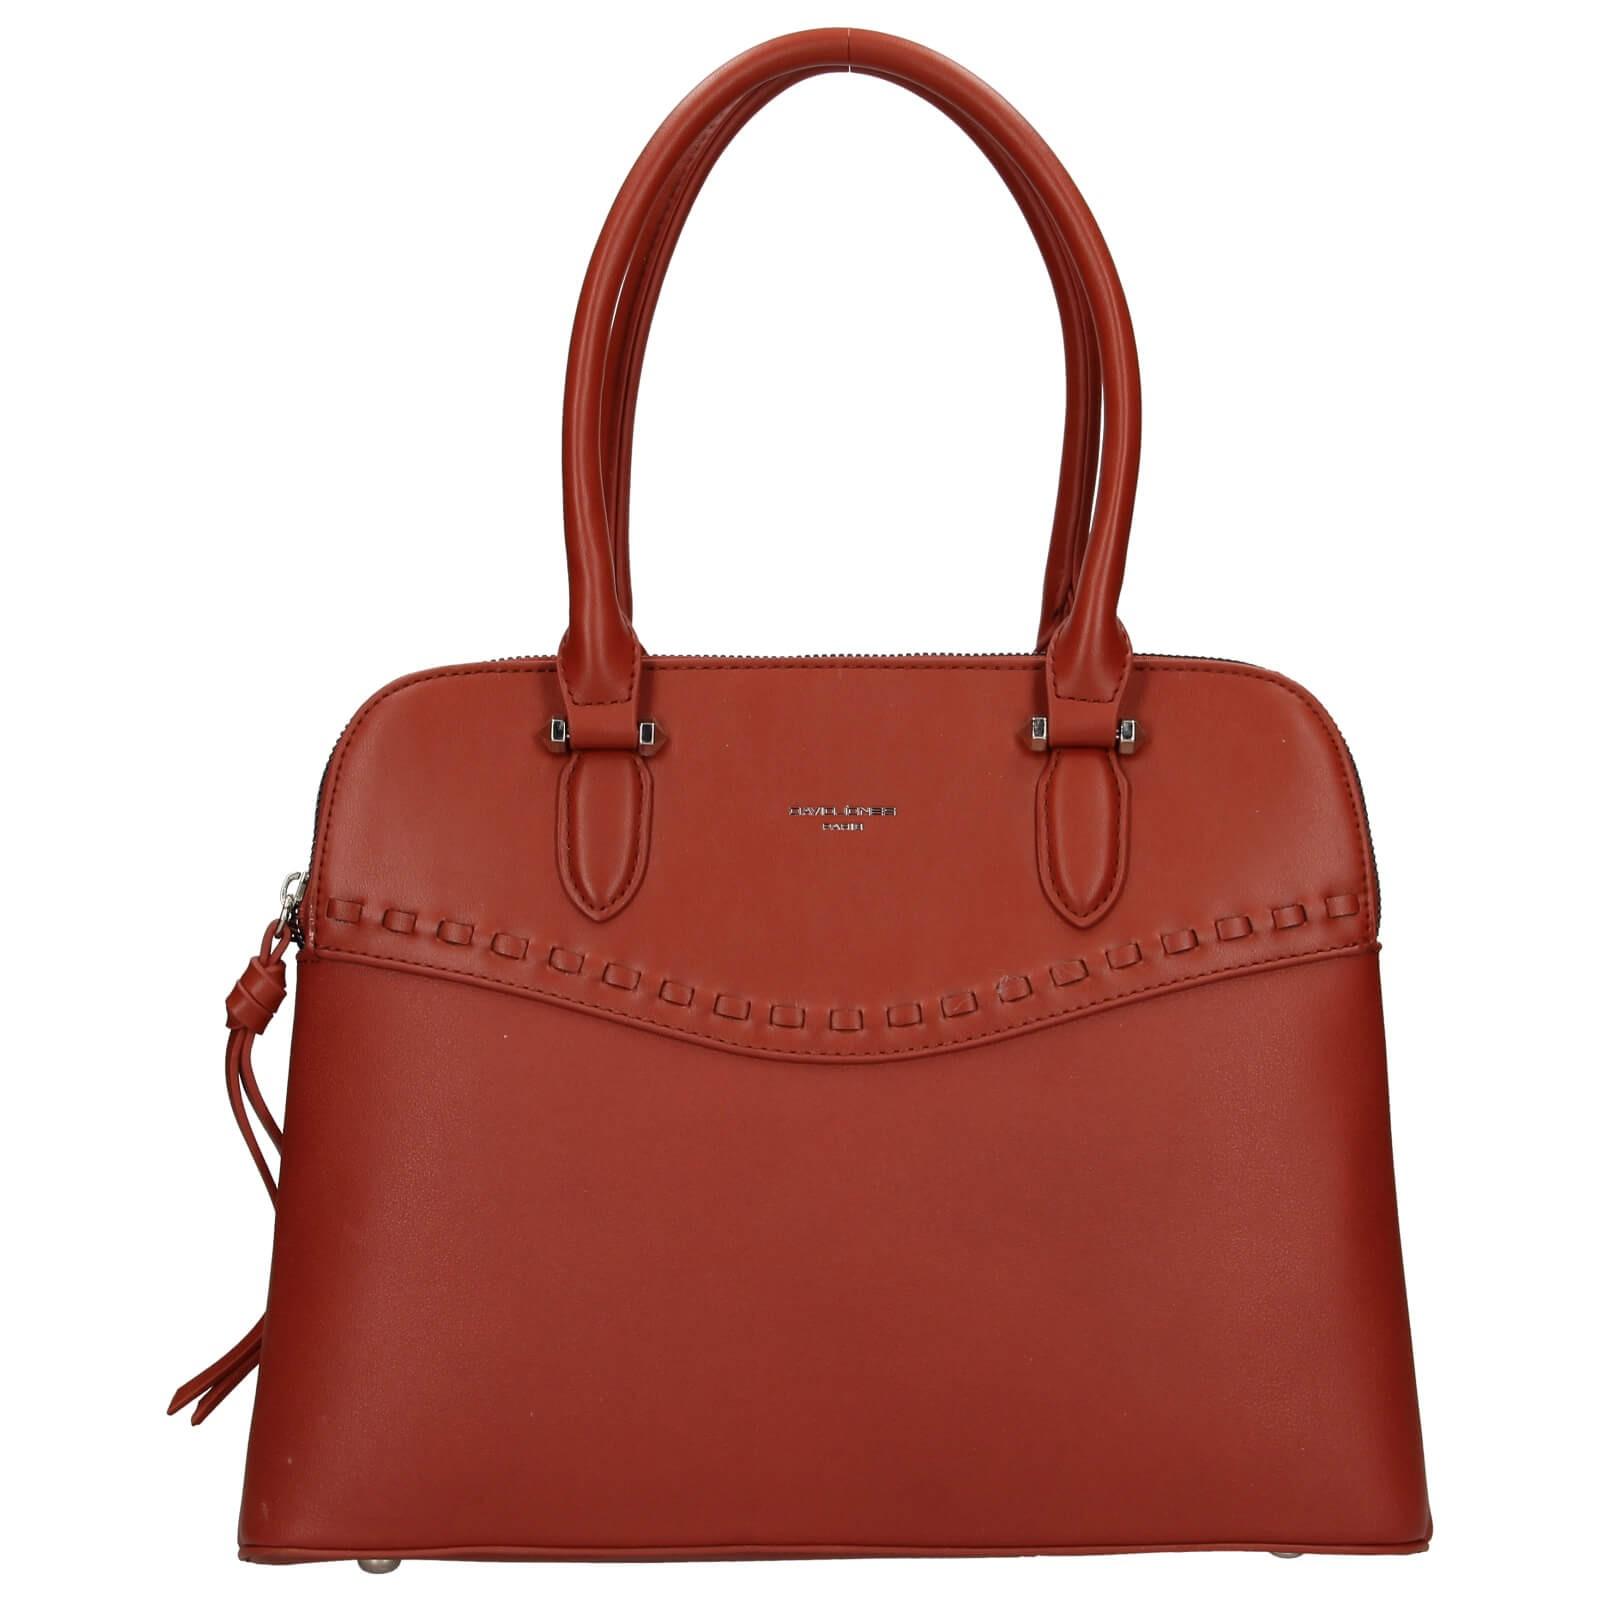 Dámska kabelka David Jones Aileen - oranžovo-hnedá